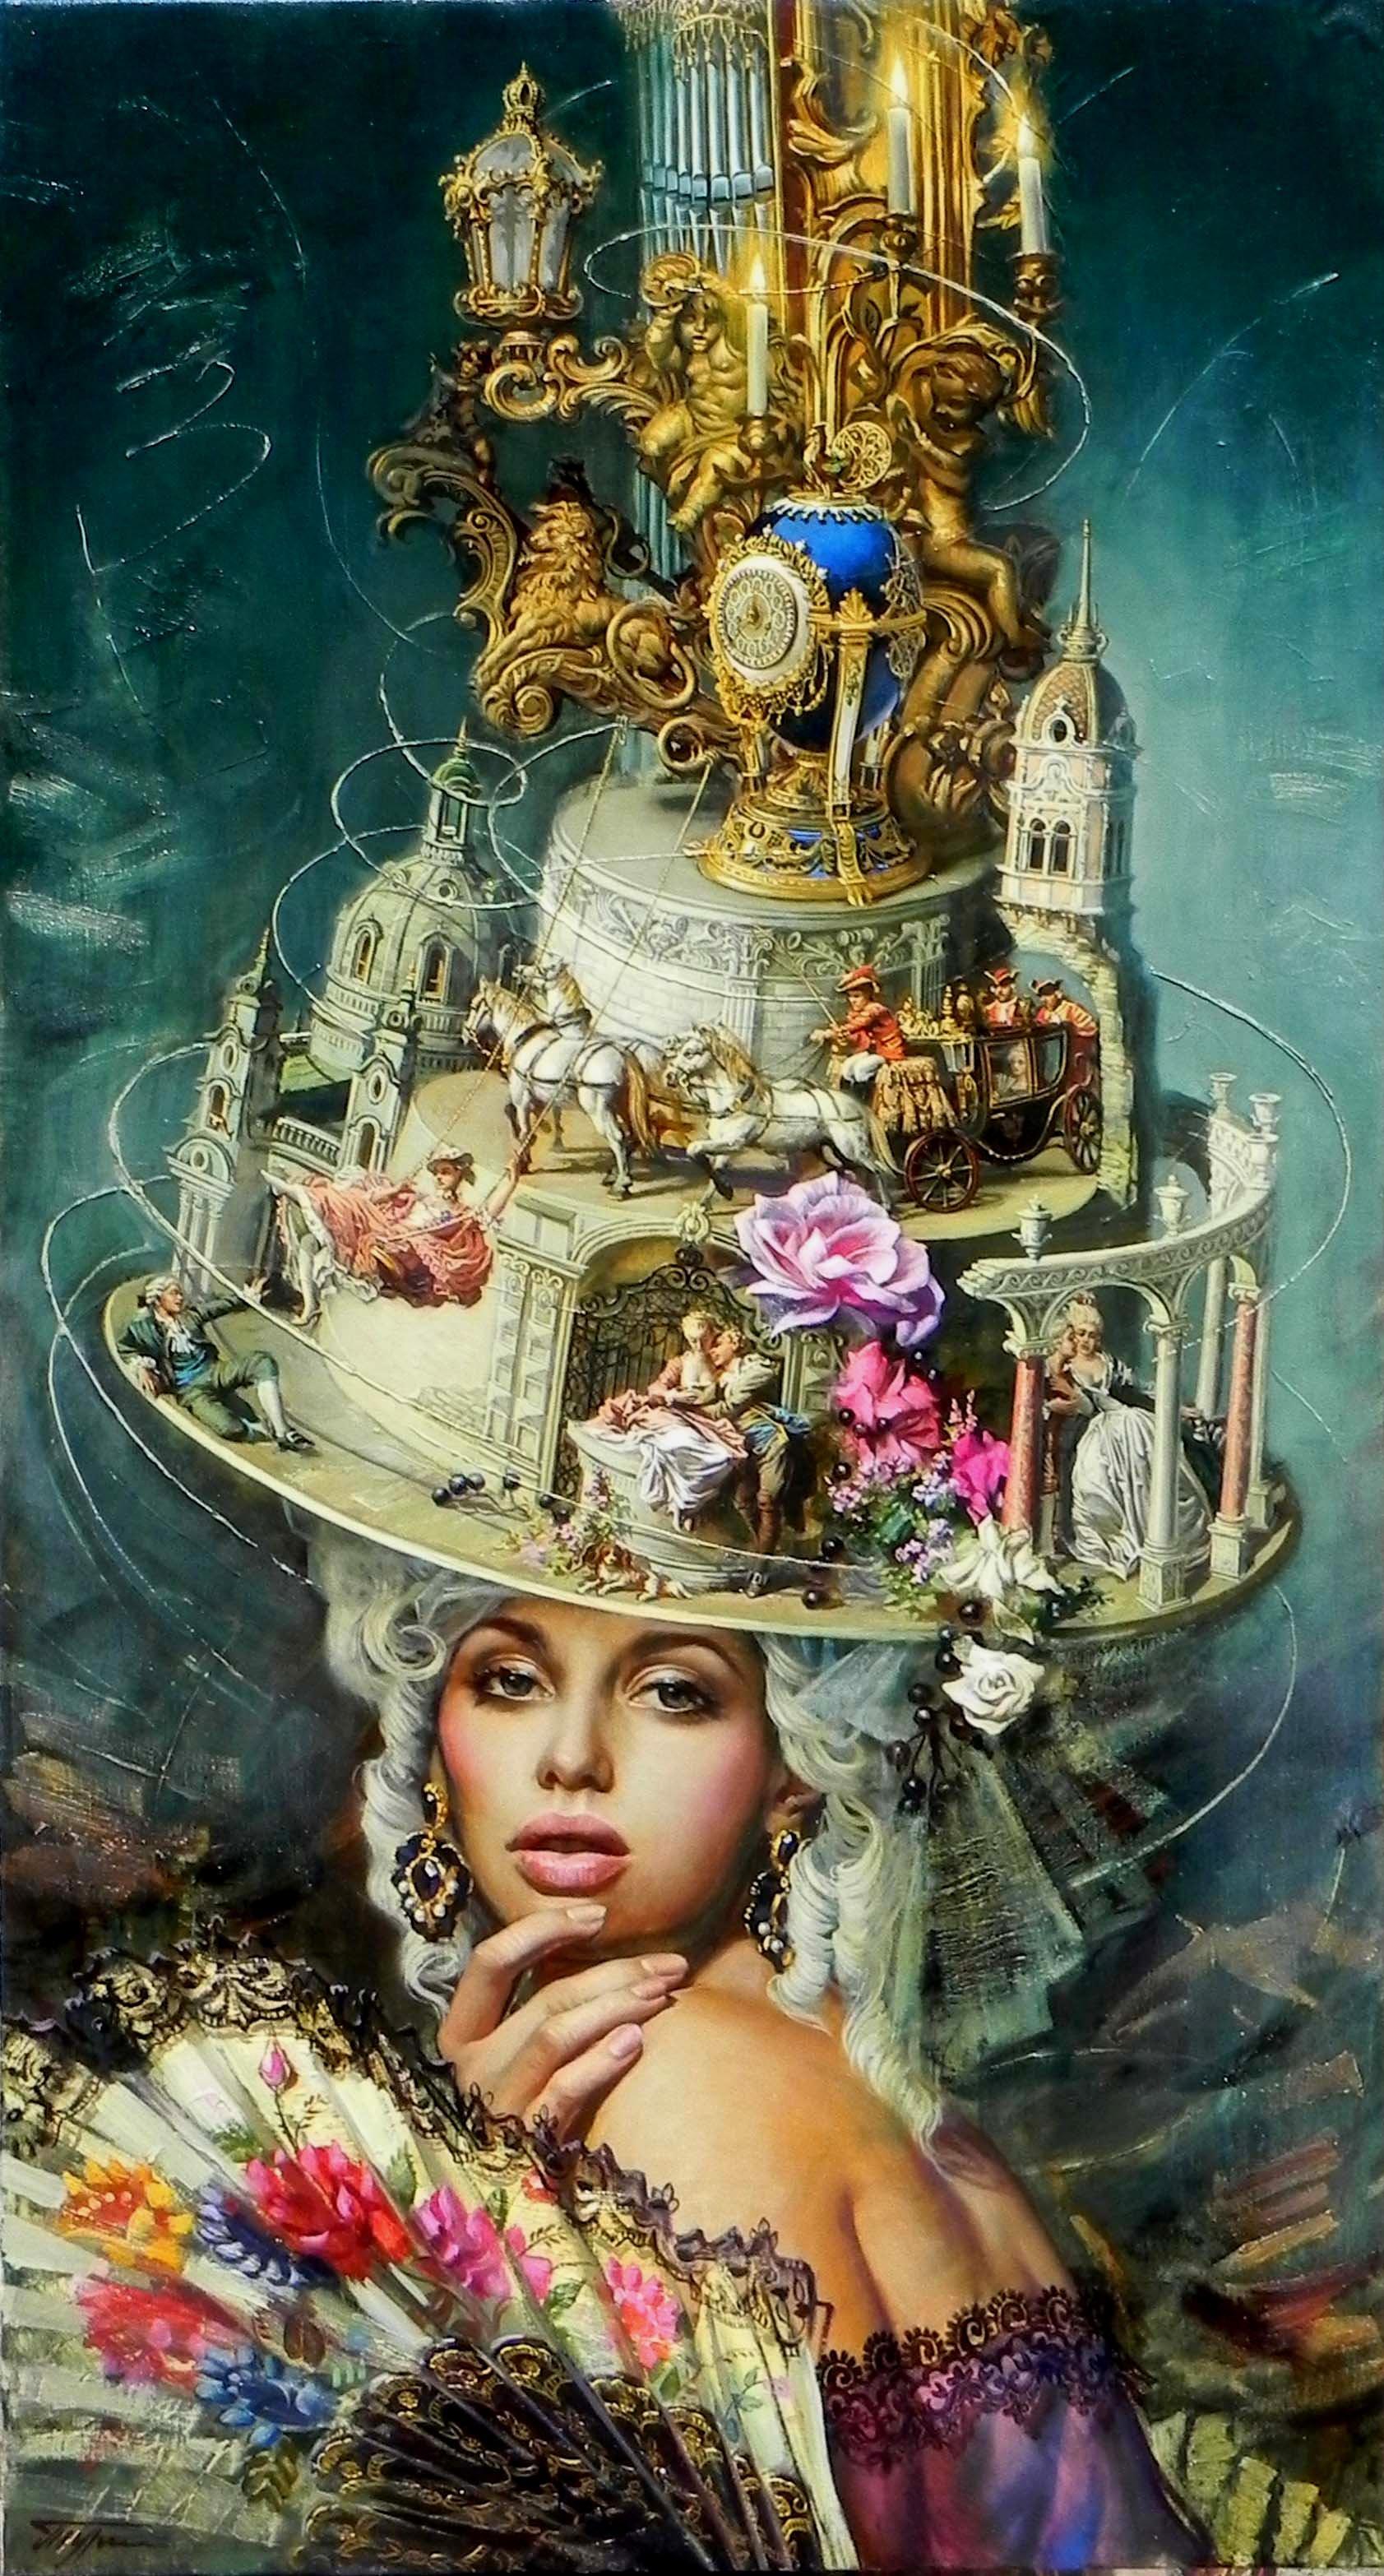 """Era of Elegance"", Oleg Turchin, Surrealism, Sophisticated, Elaborate, Hat"